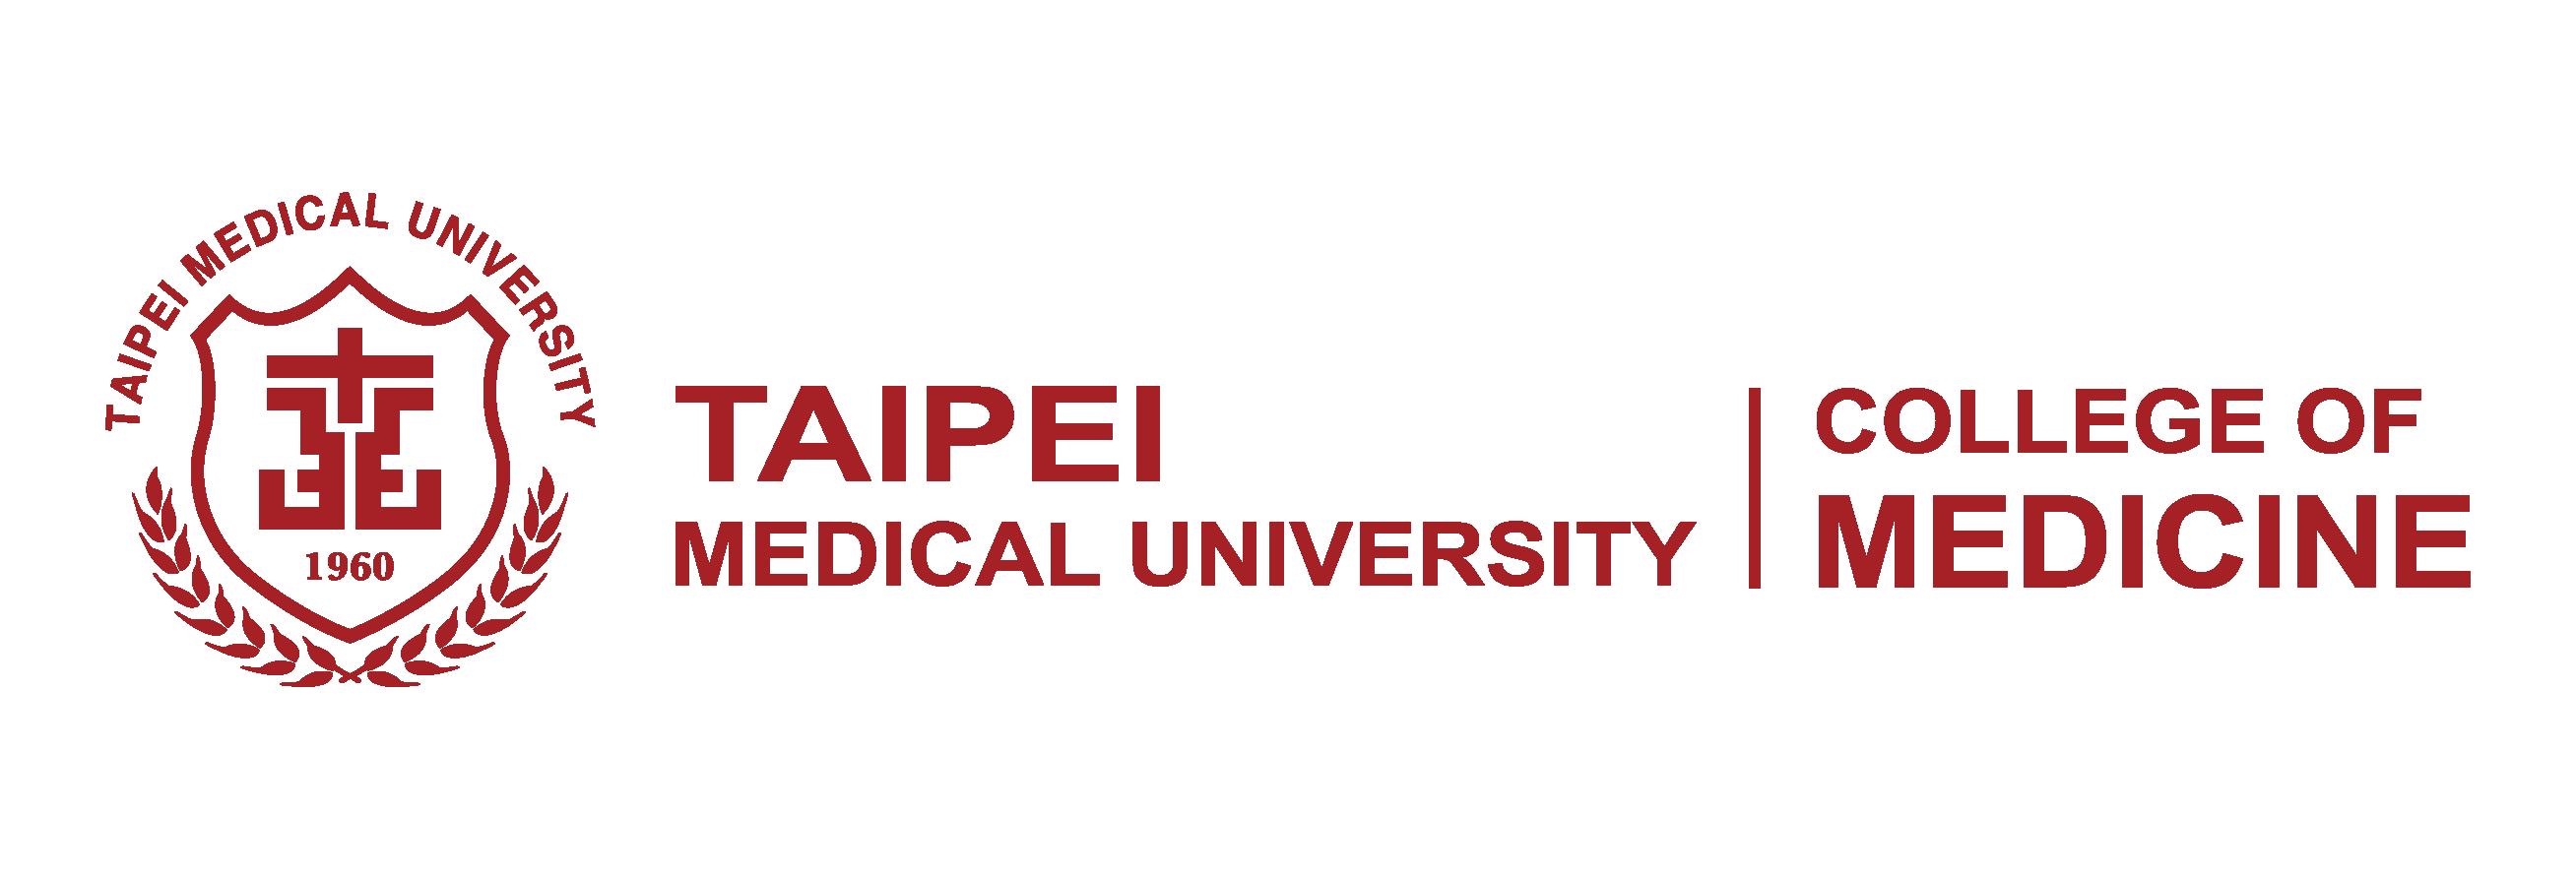 臺北醫學大學醫學院 College of Medicine, Taipei Medical University